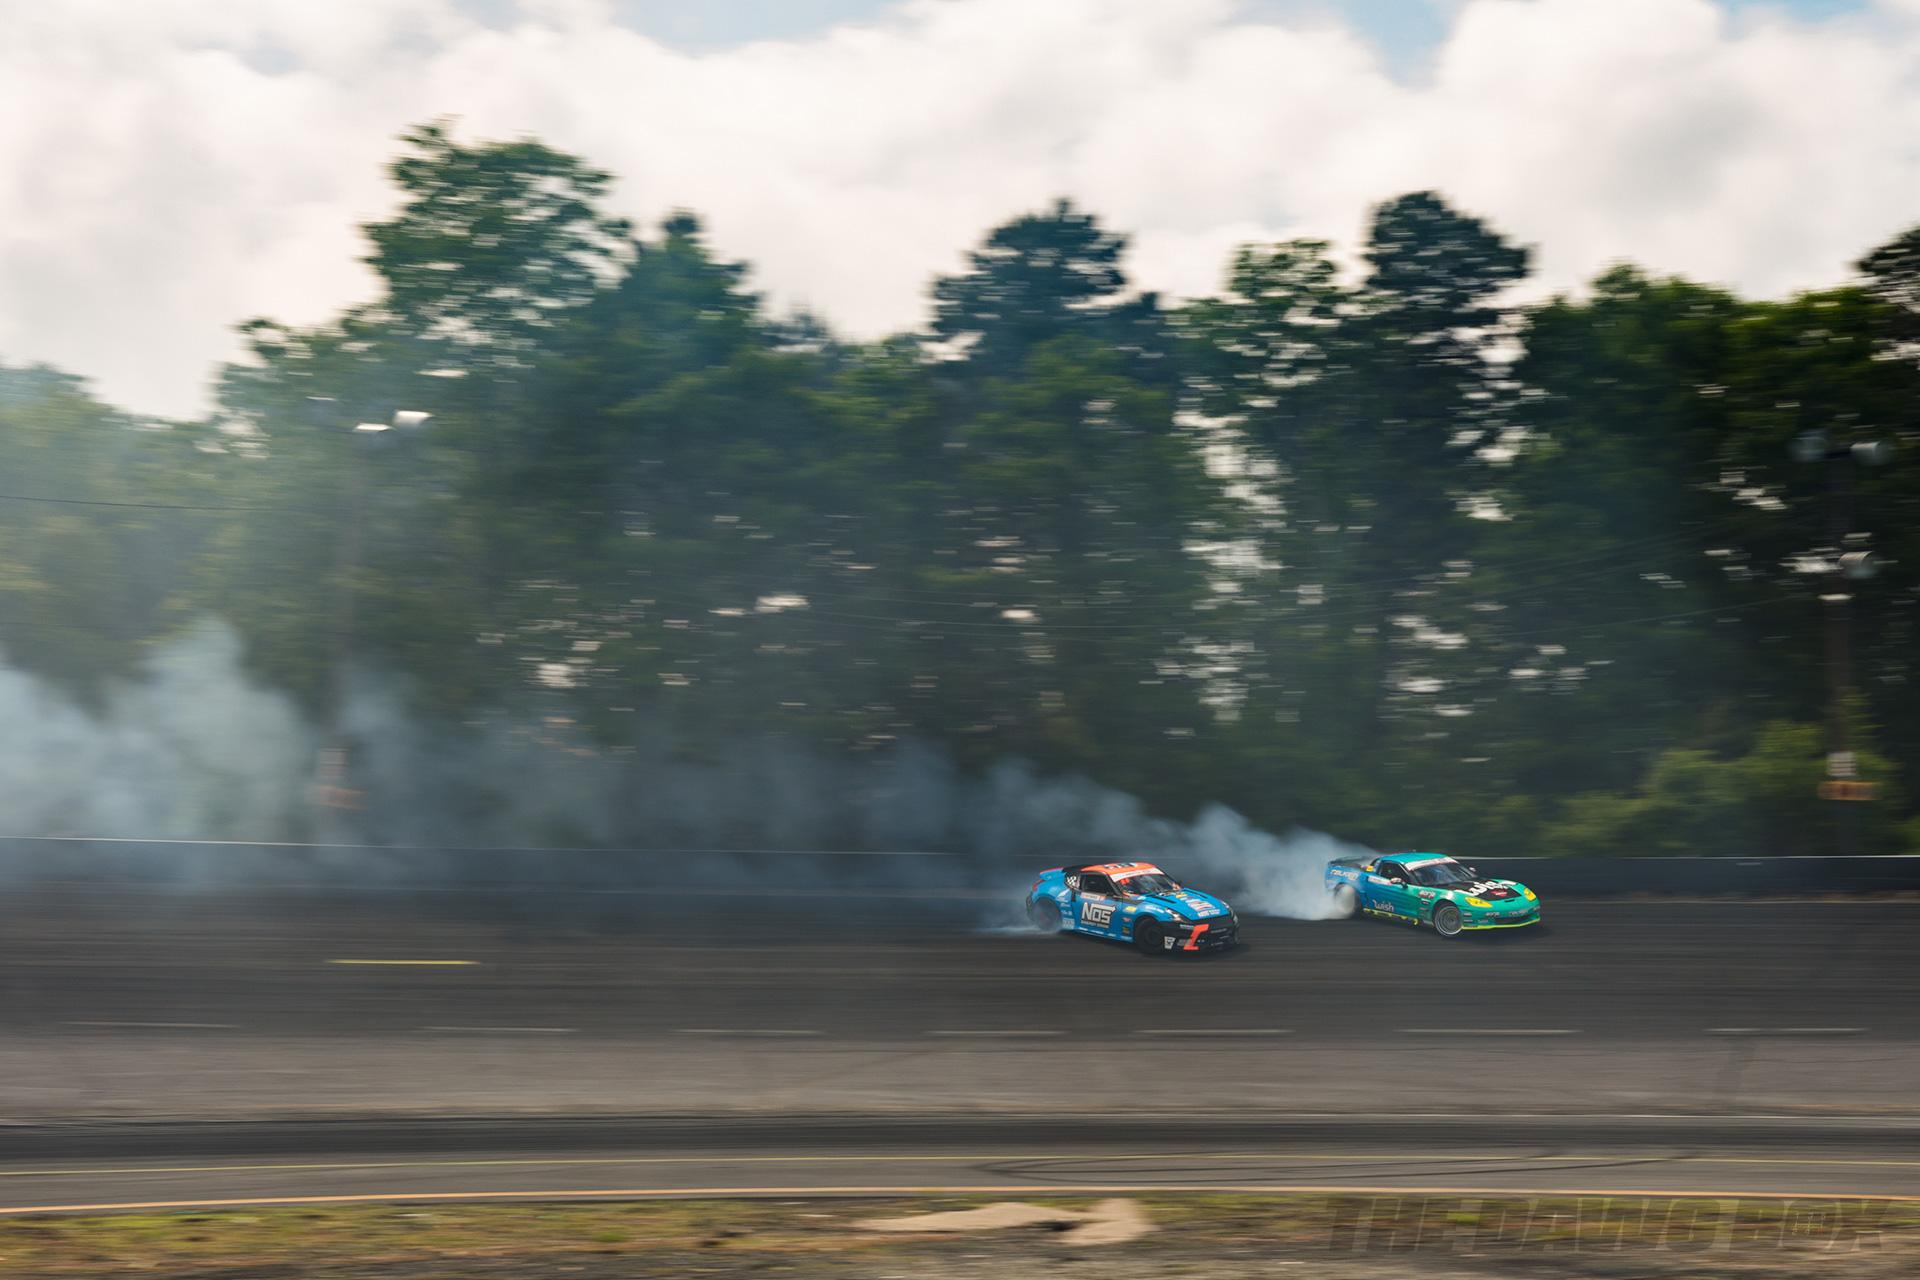 Chris Forsberg Nissan 370Z and Matt Field C6 Corvette drifting at FD